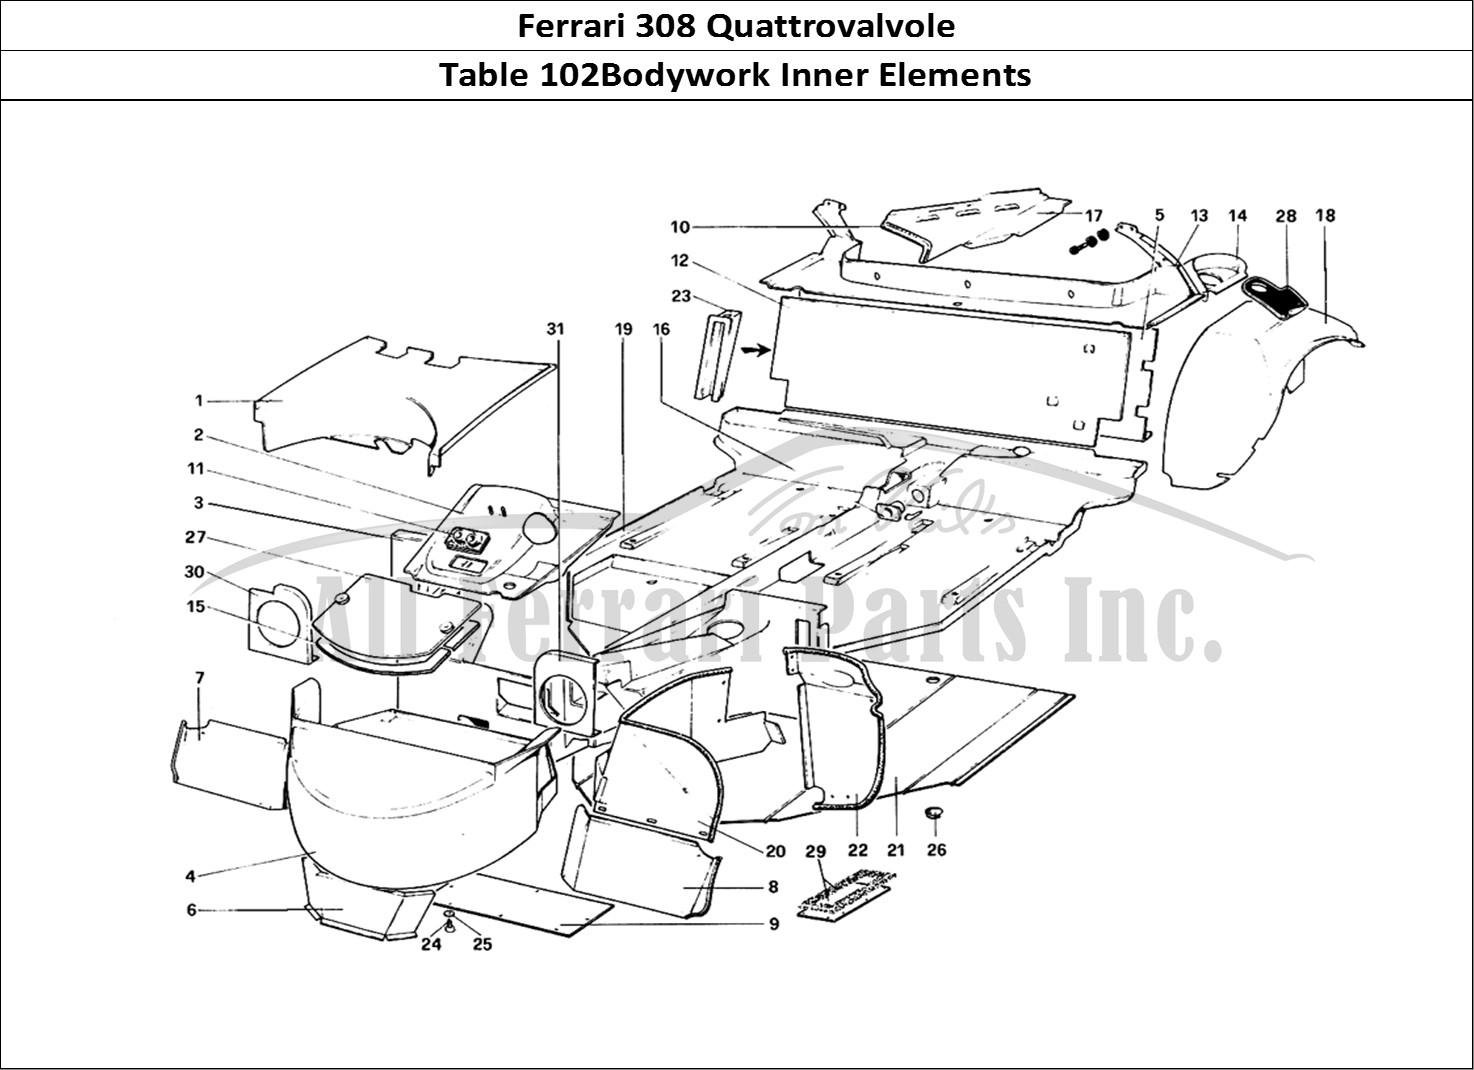 Buy original Ferrari 308 Quattrovalvole 102Bodywork Inner